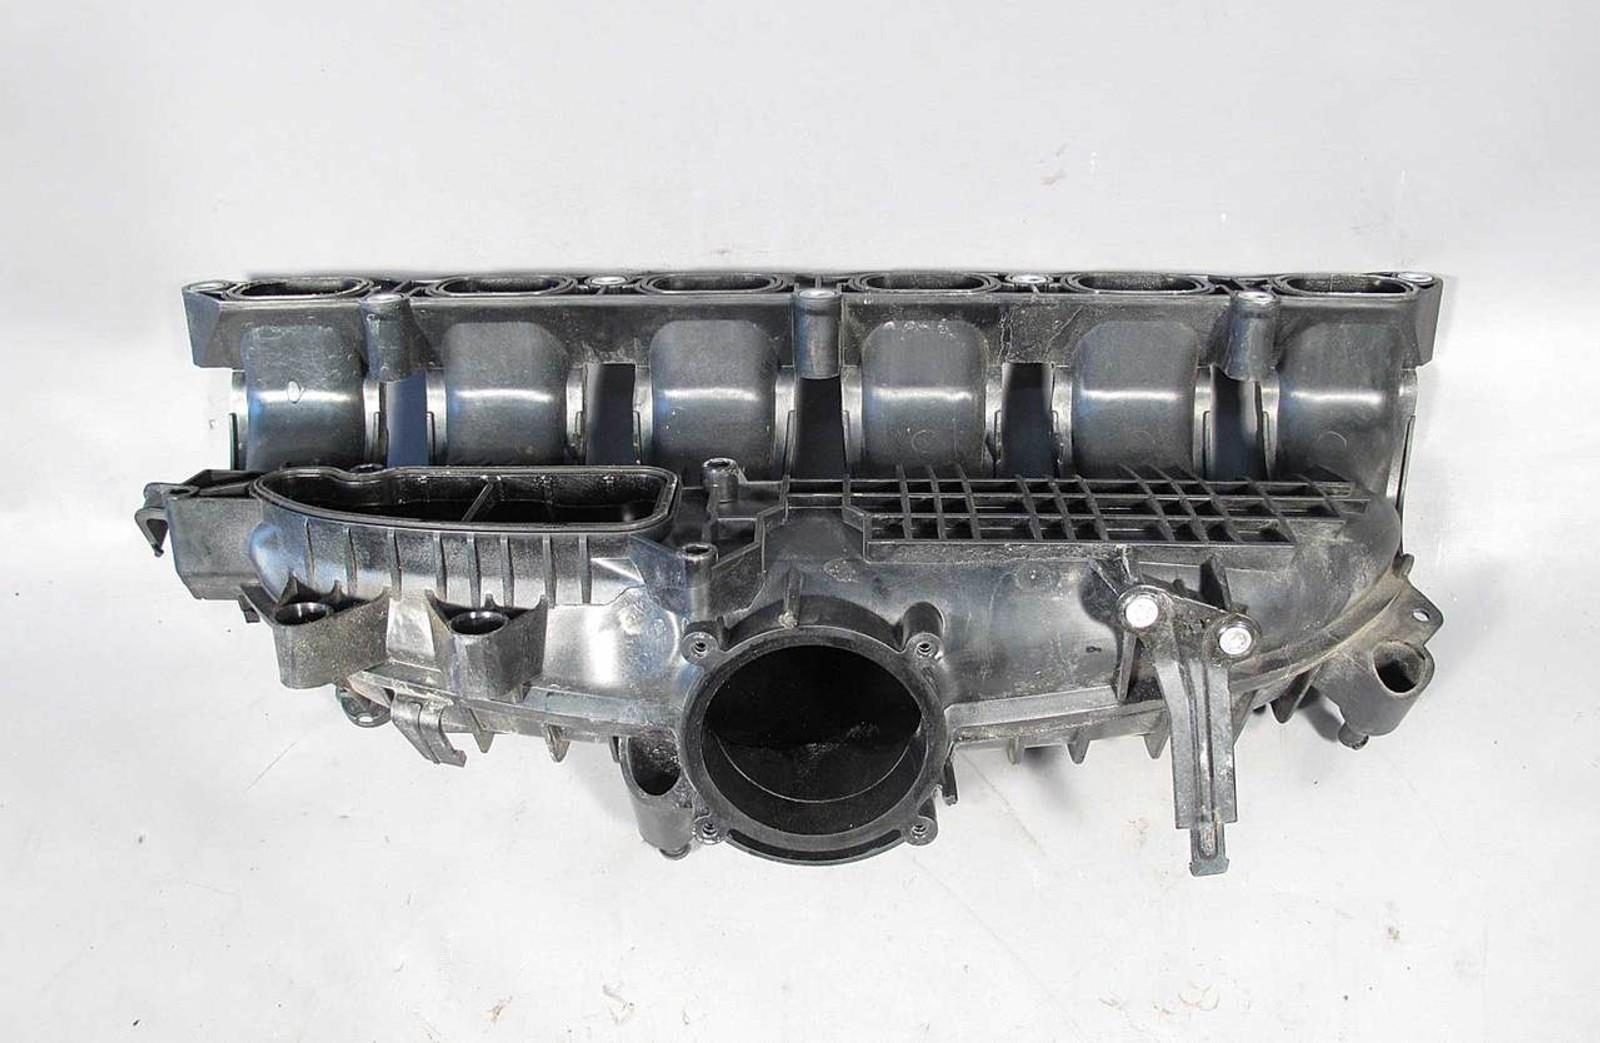 2011-2015 BMW N55 6-Cyl Turbo Air Intake Manifold E82 E90 F01 F10 F30 USED OEM